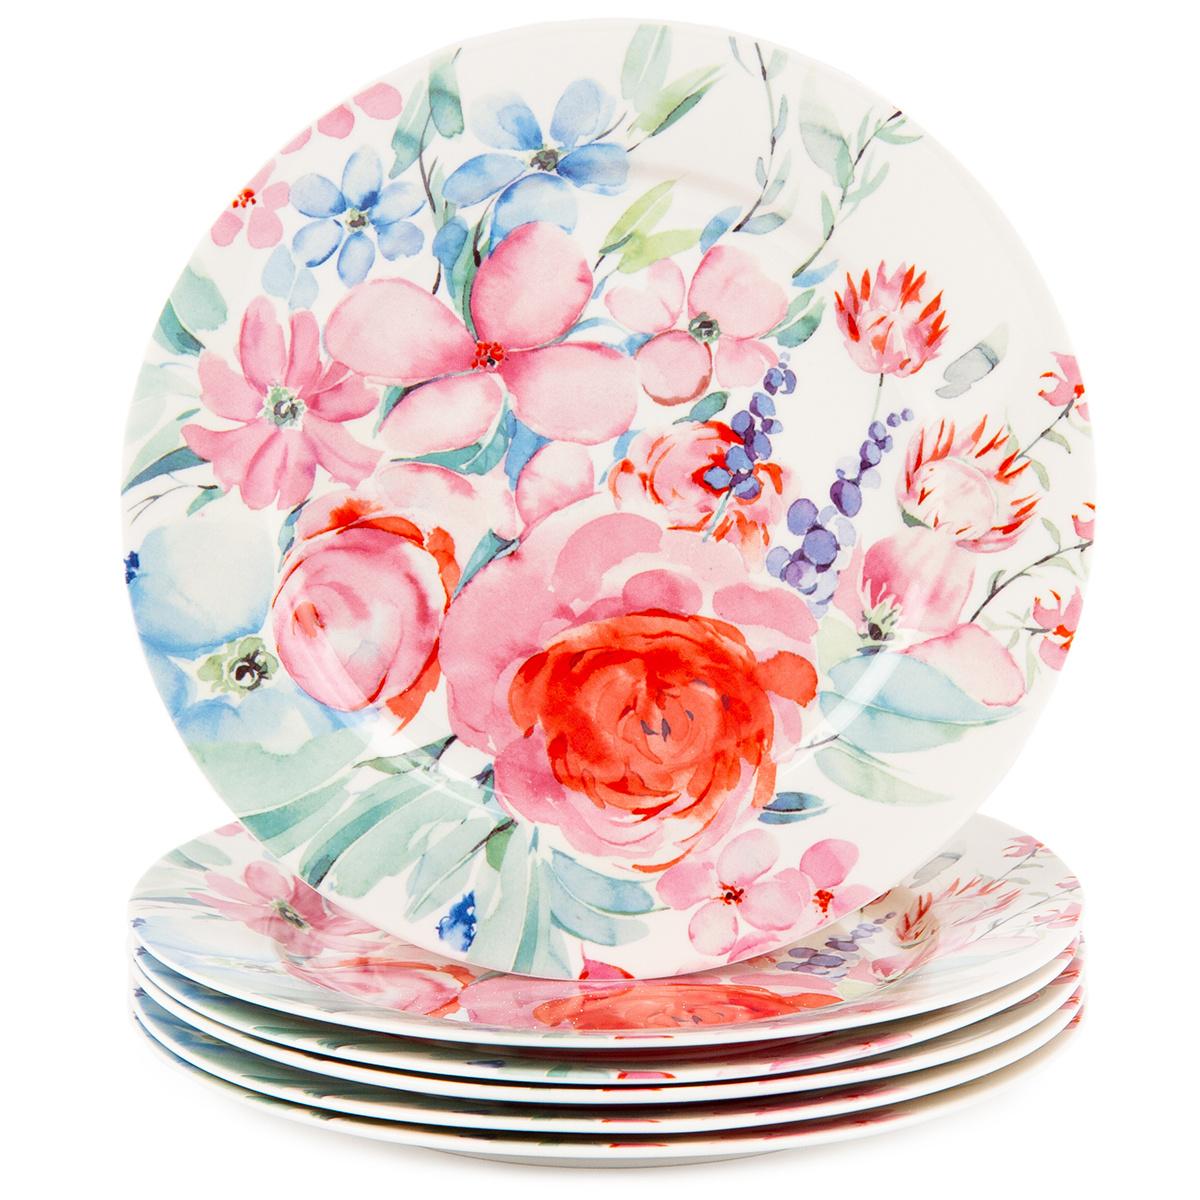 Altom 6-dielna sada dezertných tanierov Pastelový  květ 19 cm